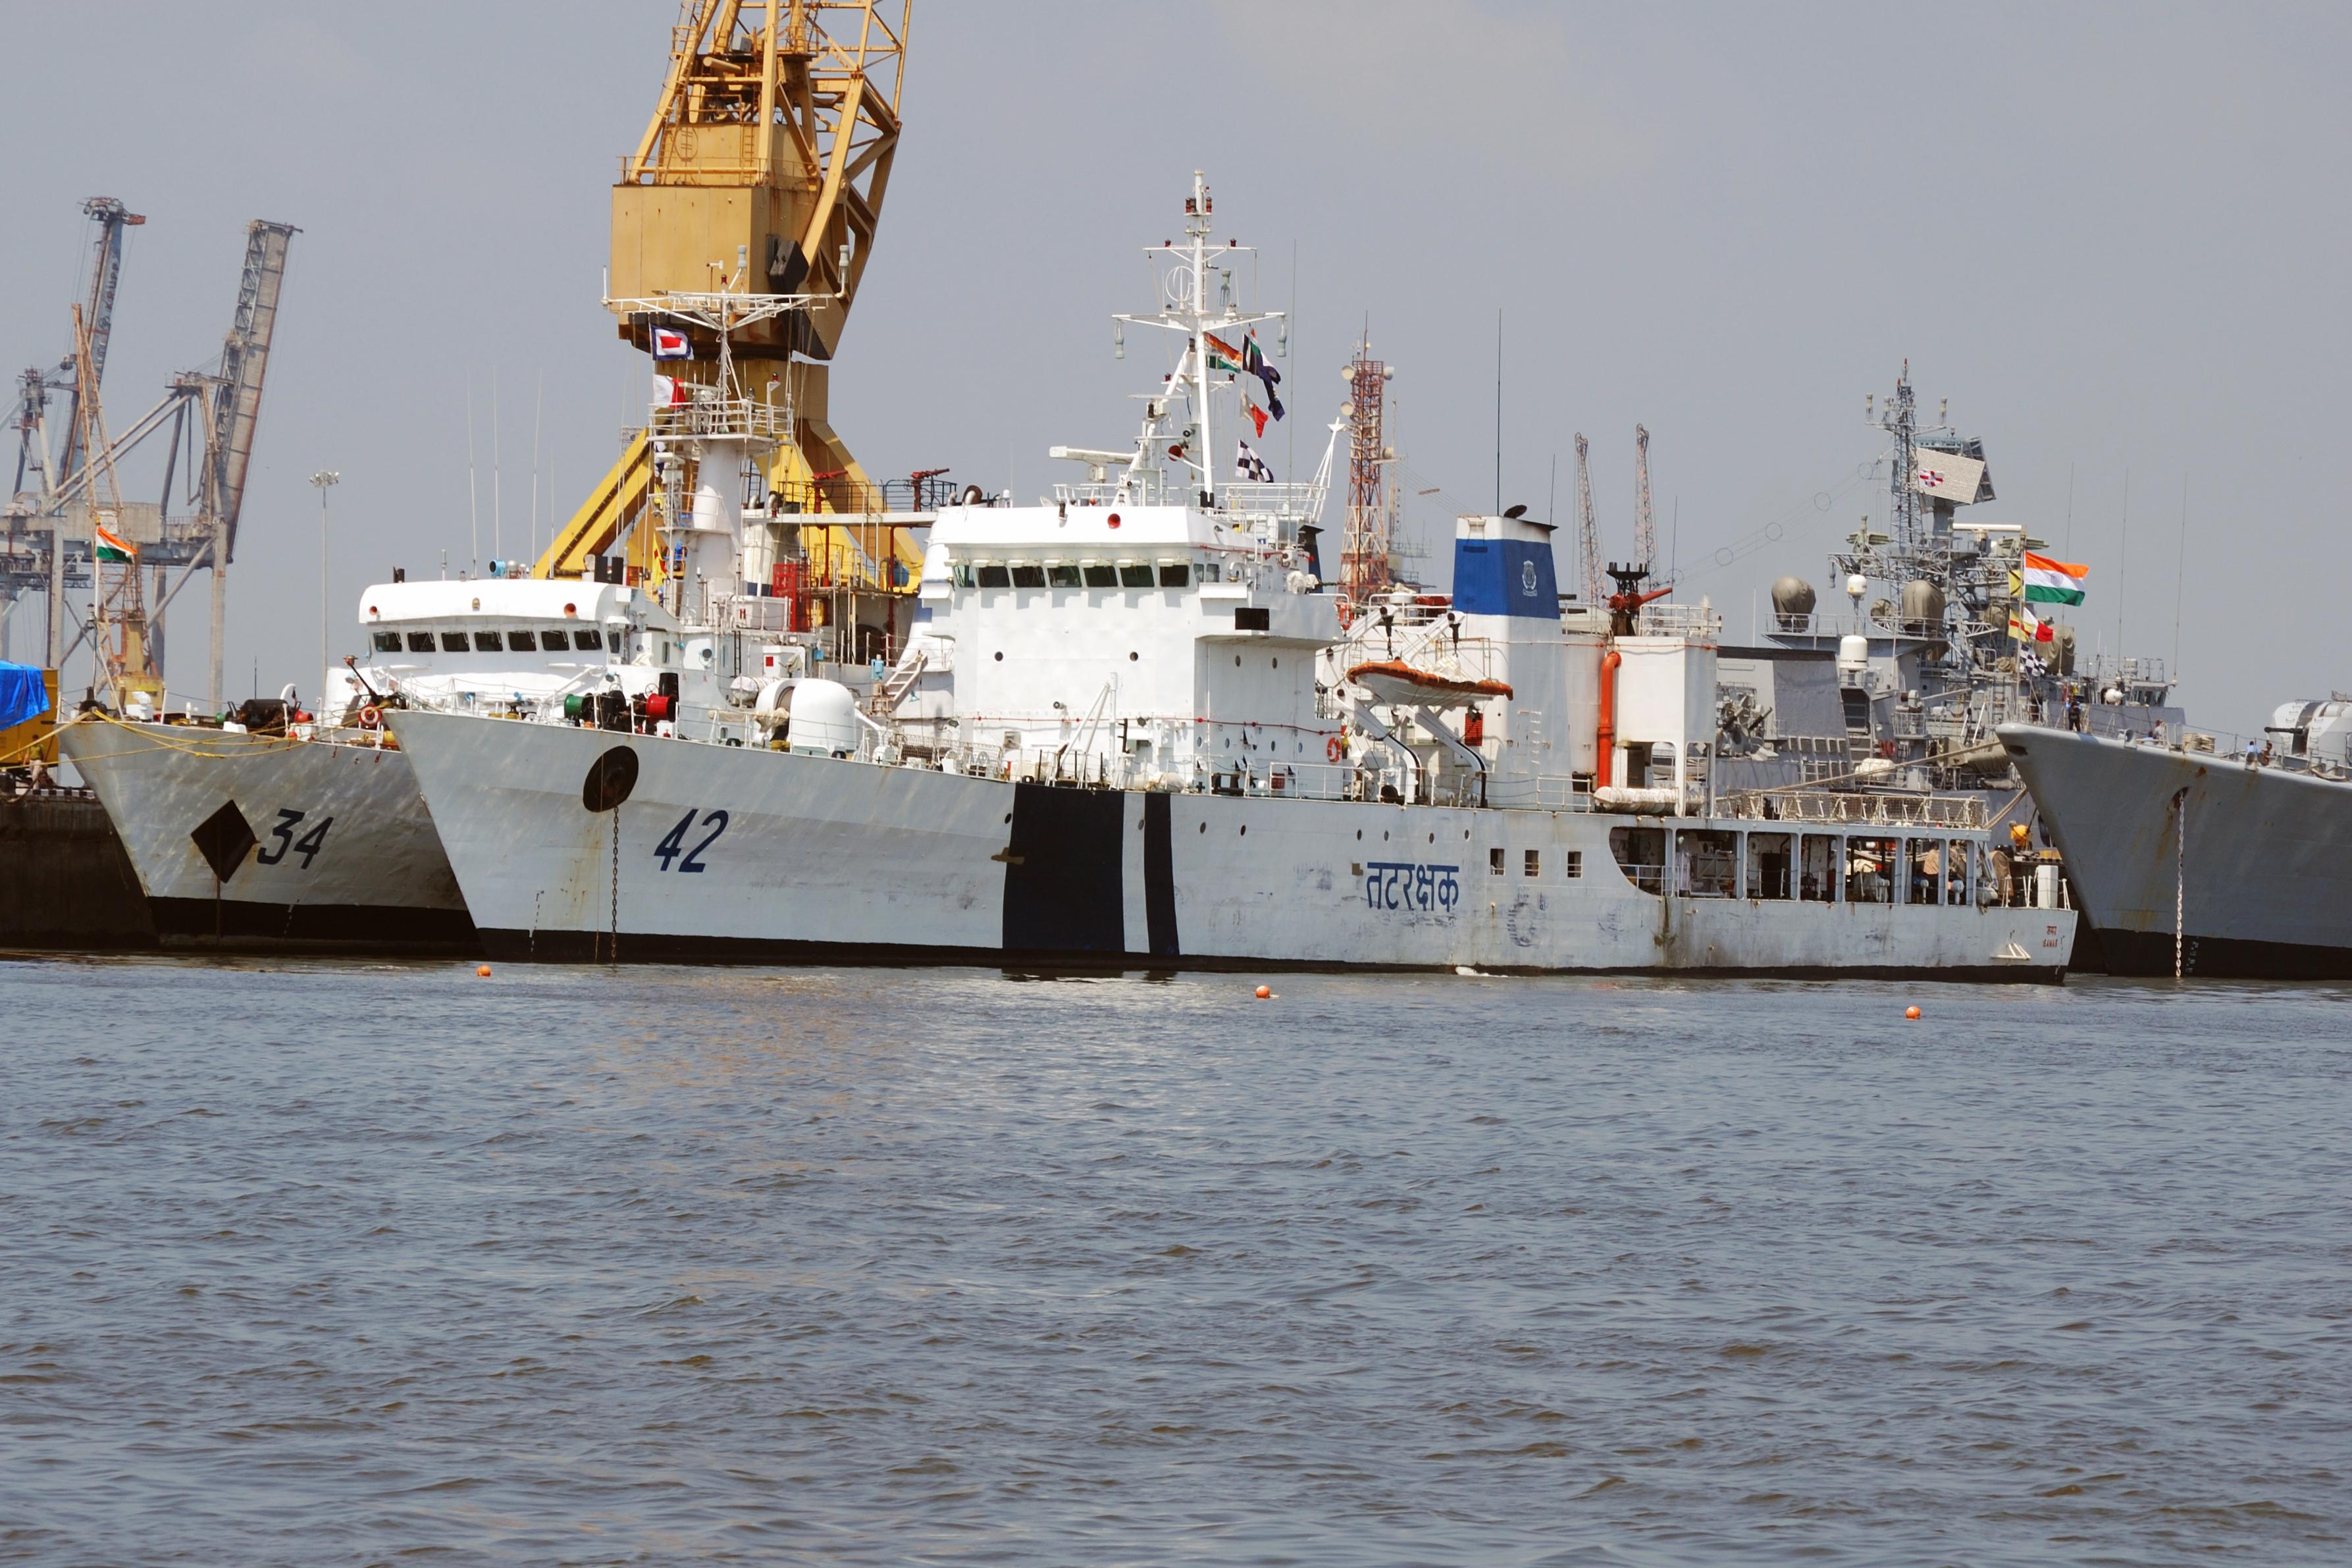 Indian Coast Guard Ship Shaurya Commissioned in Goa